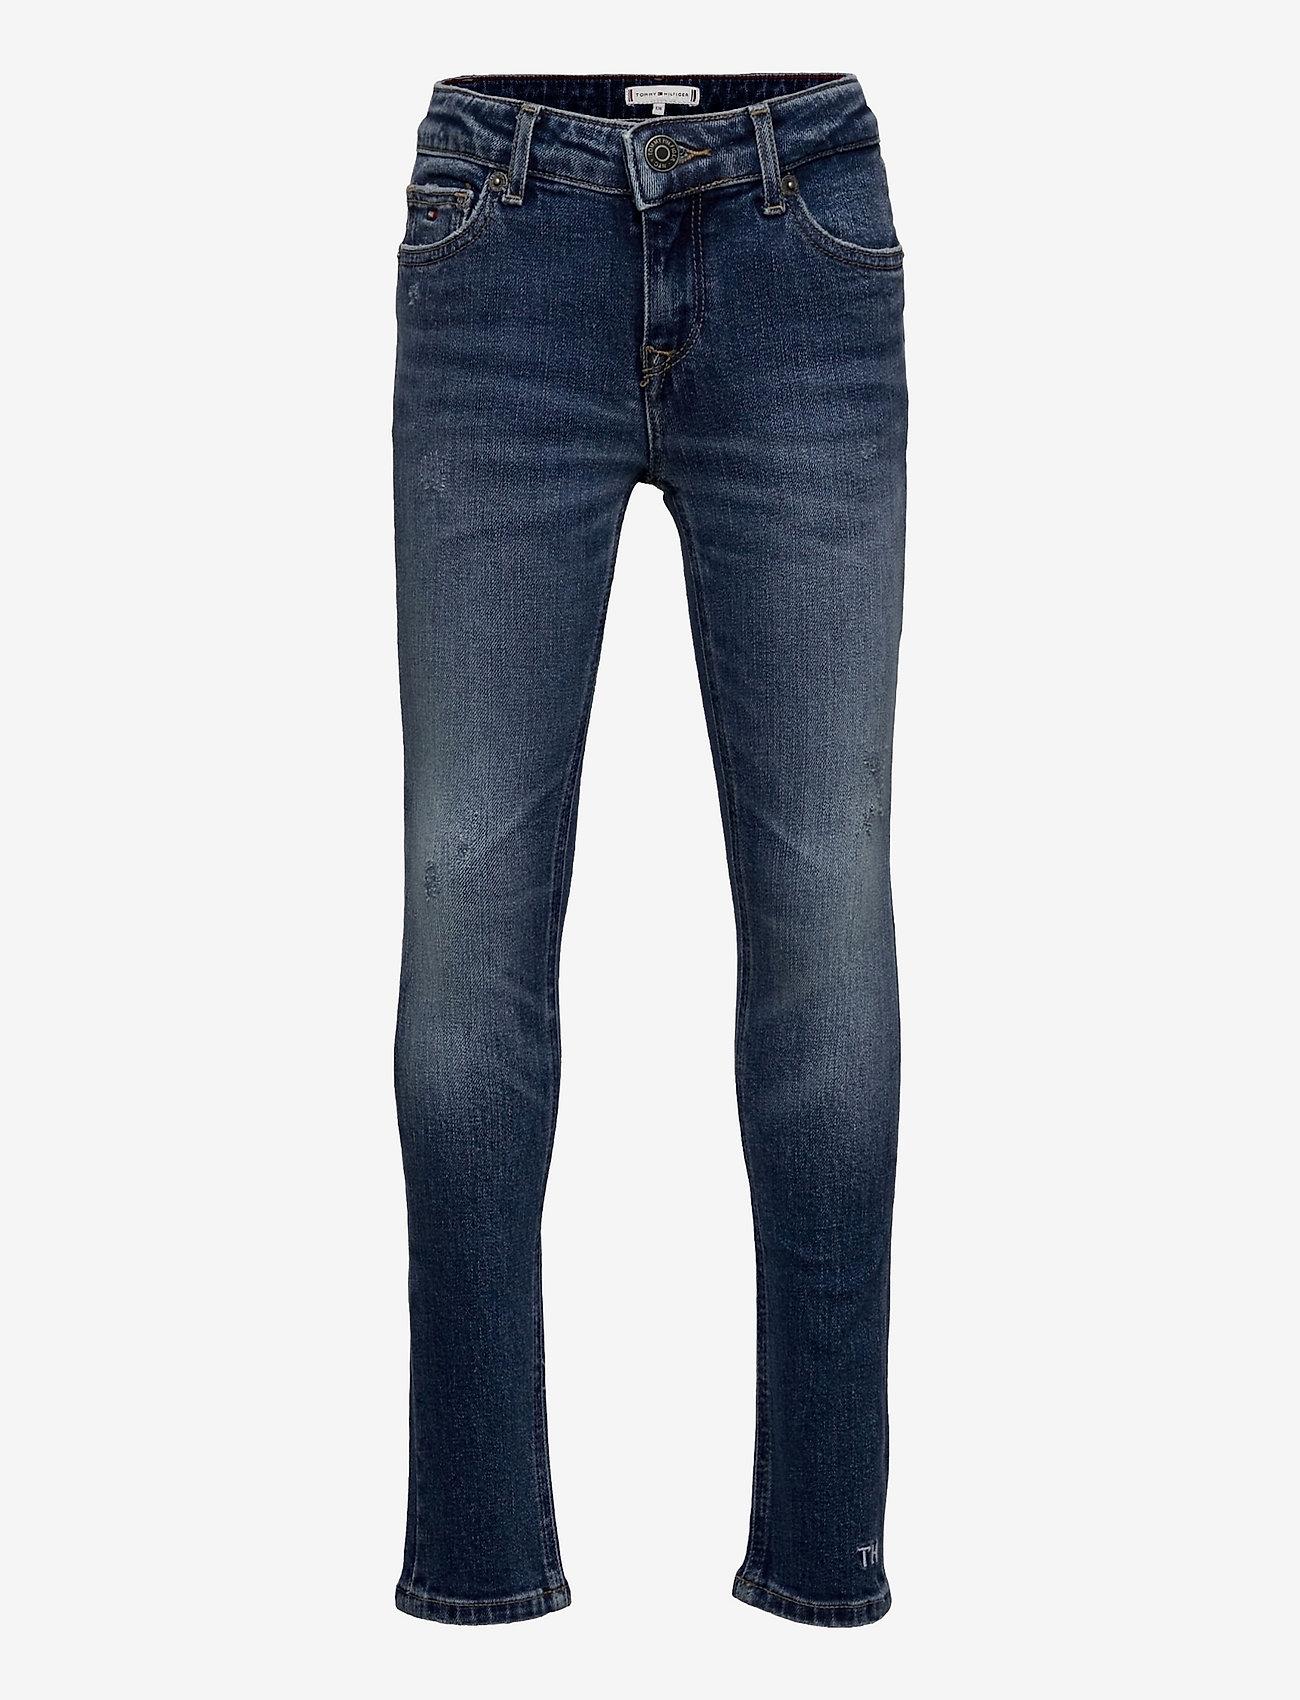 Tommy Hilfiger - NORA SKINNY - jeans - medbldscoporc - 0